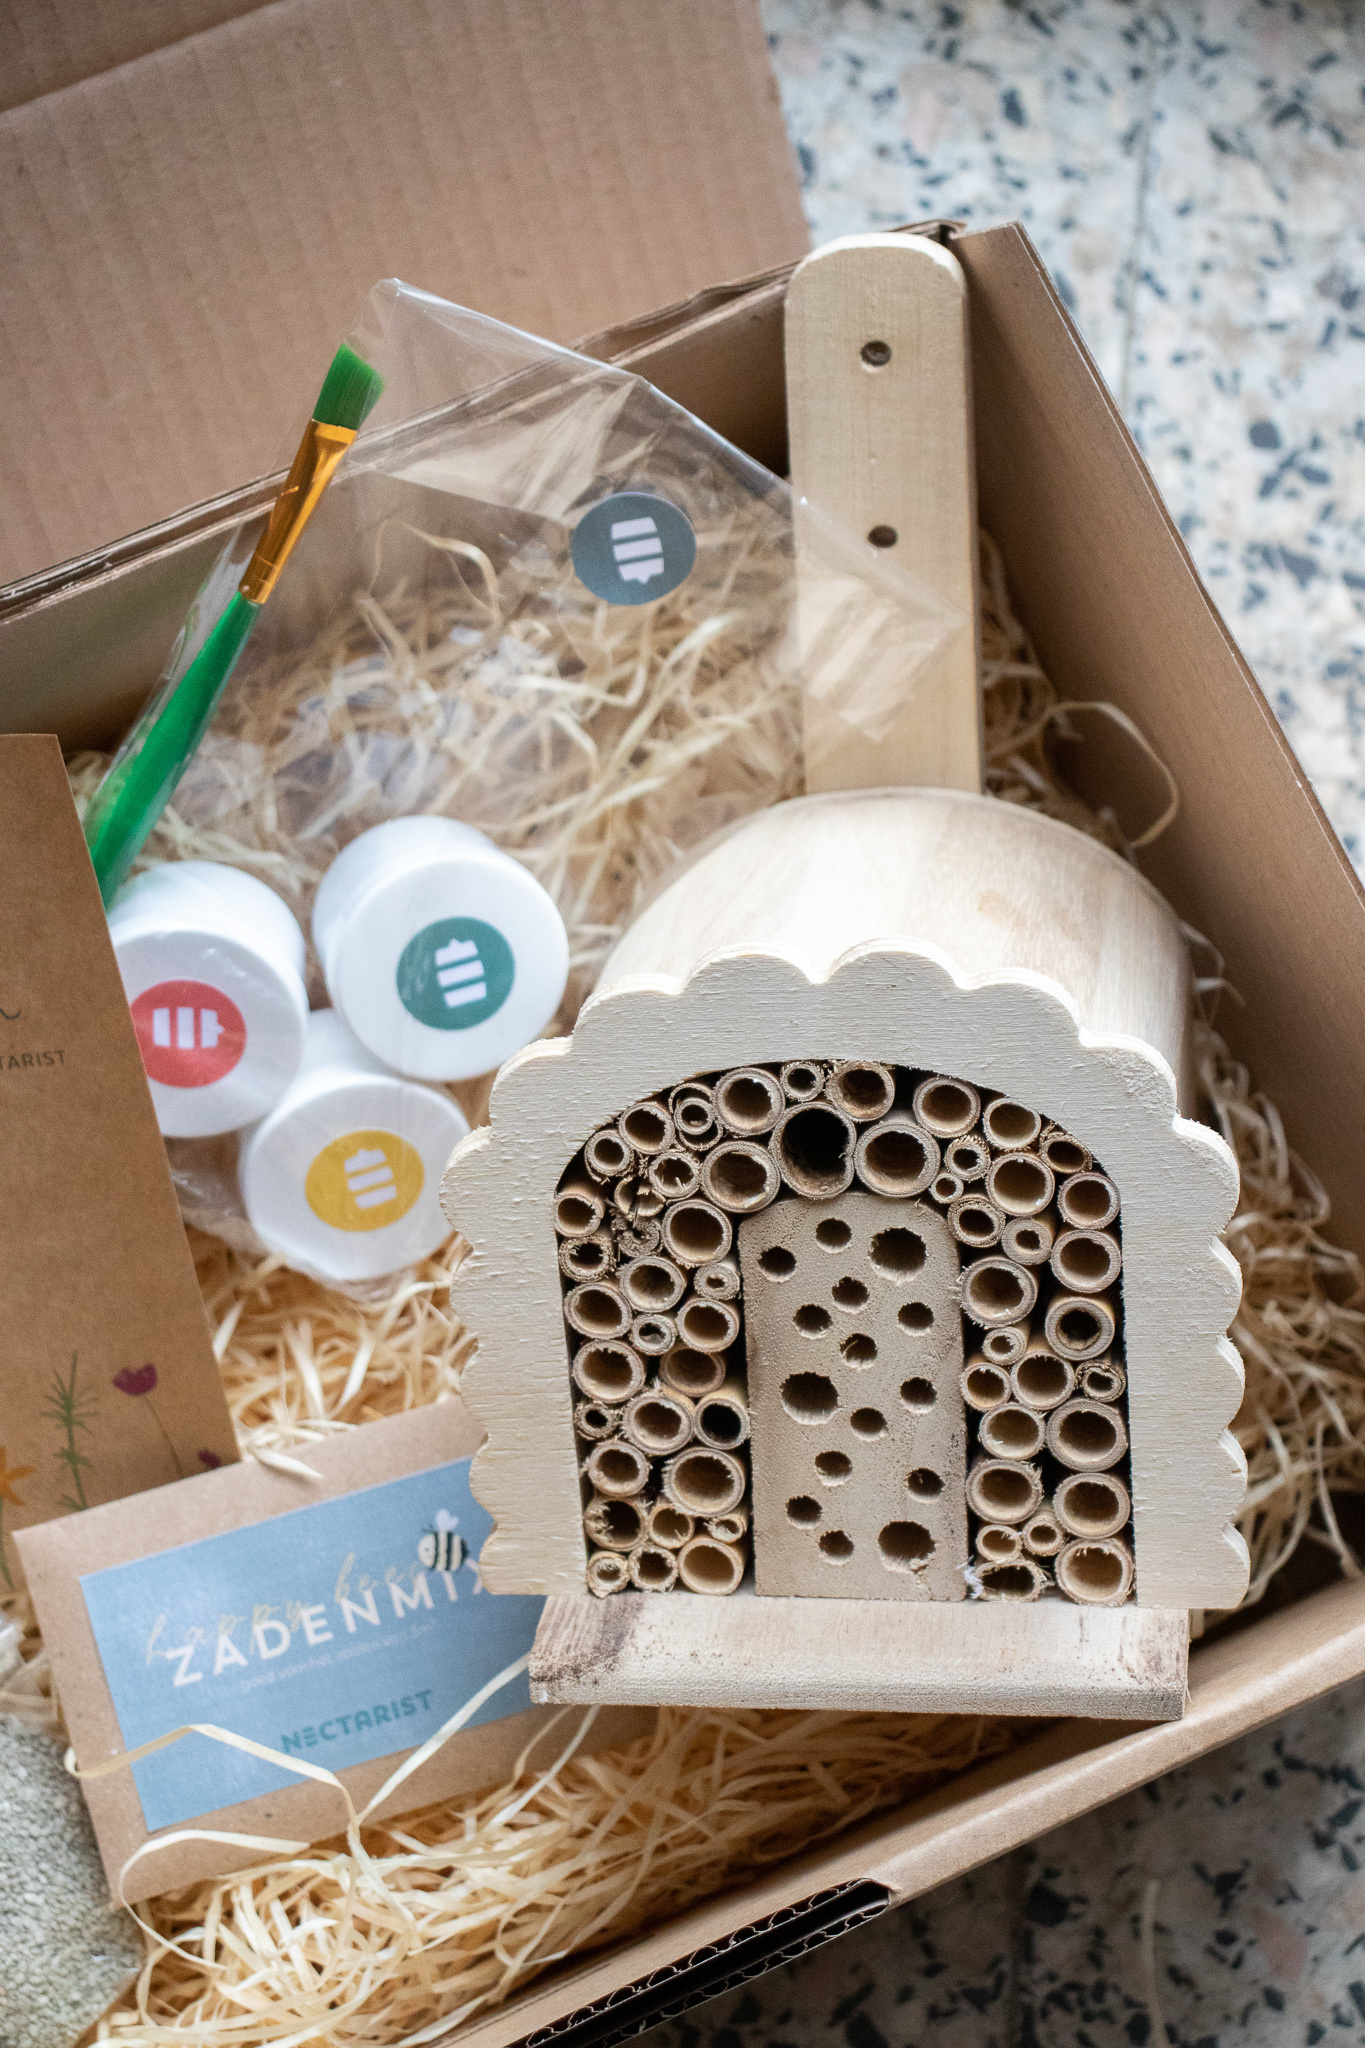 DIY zadenbom + insectenhotel-2